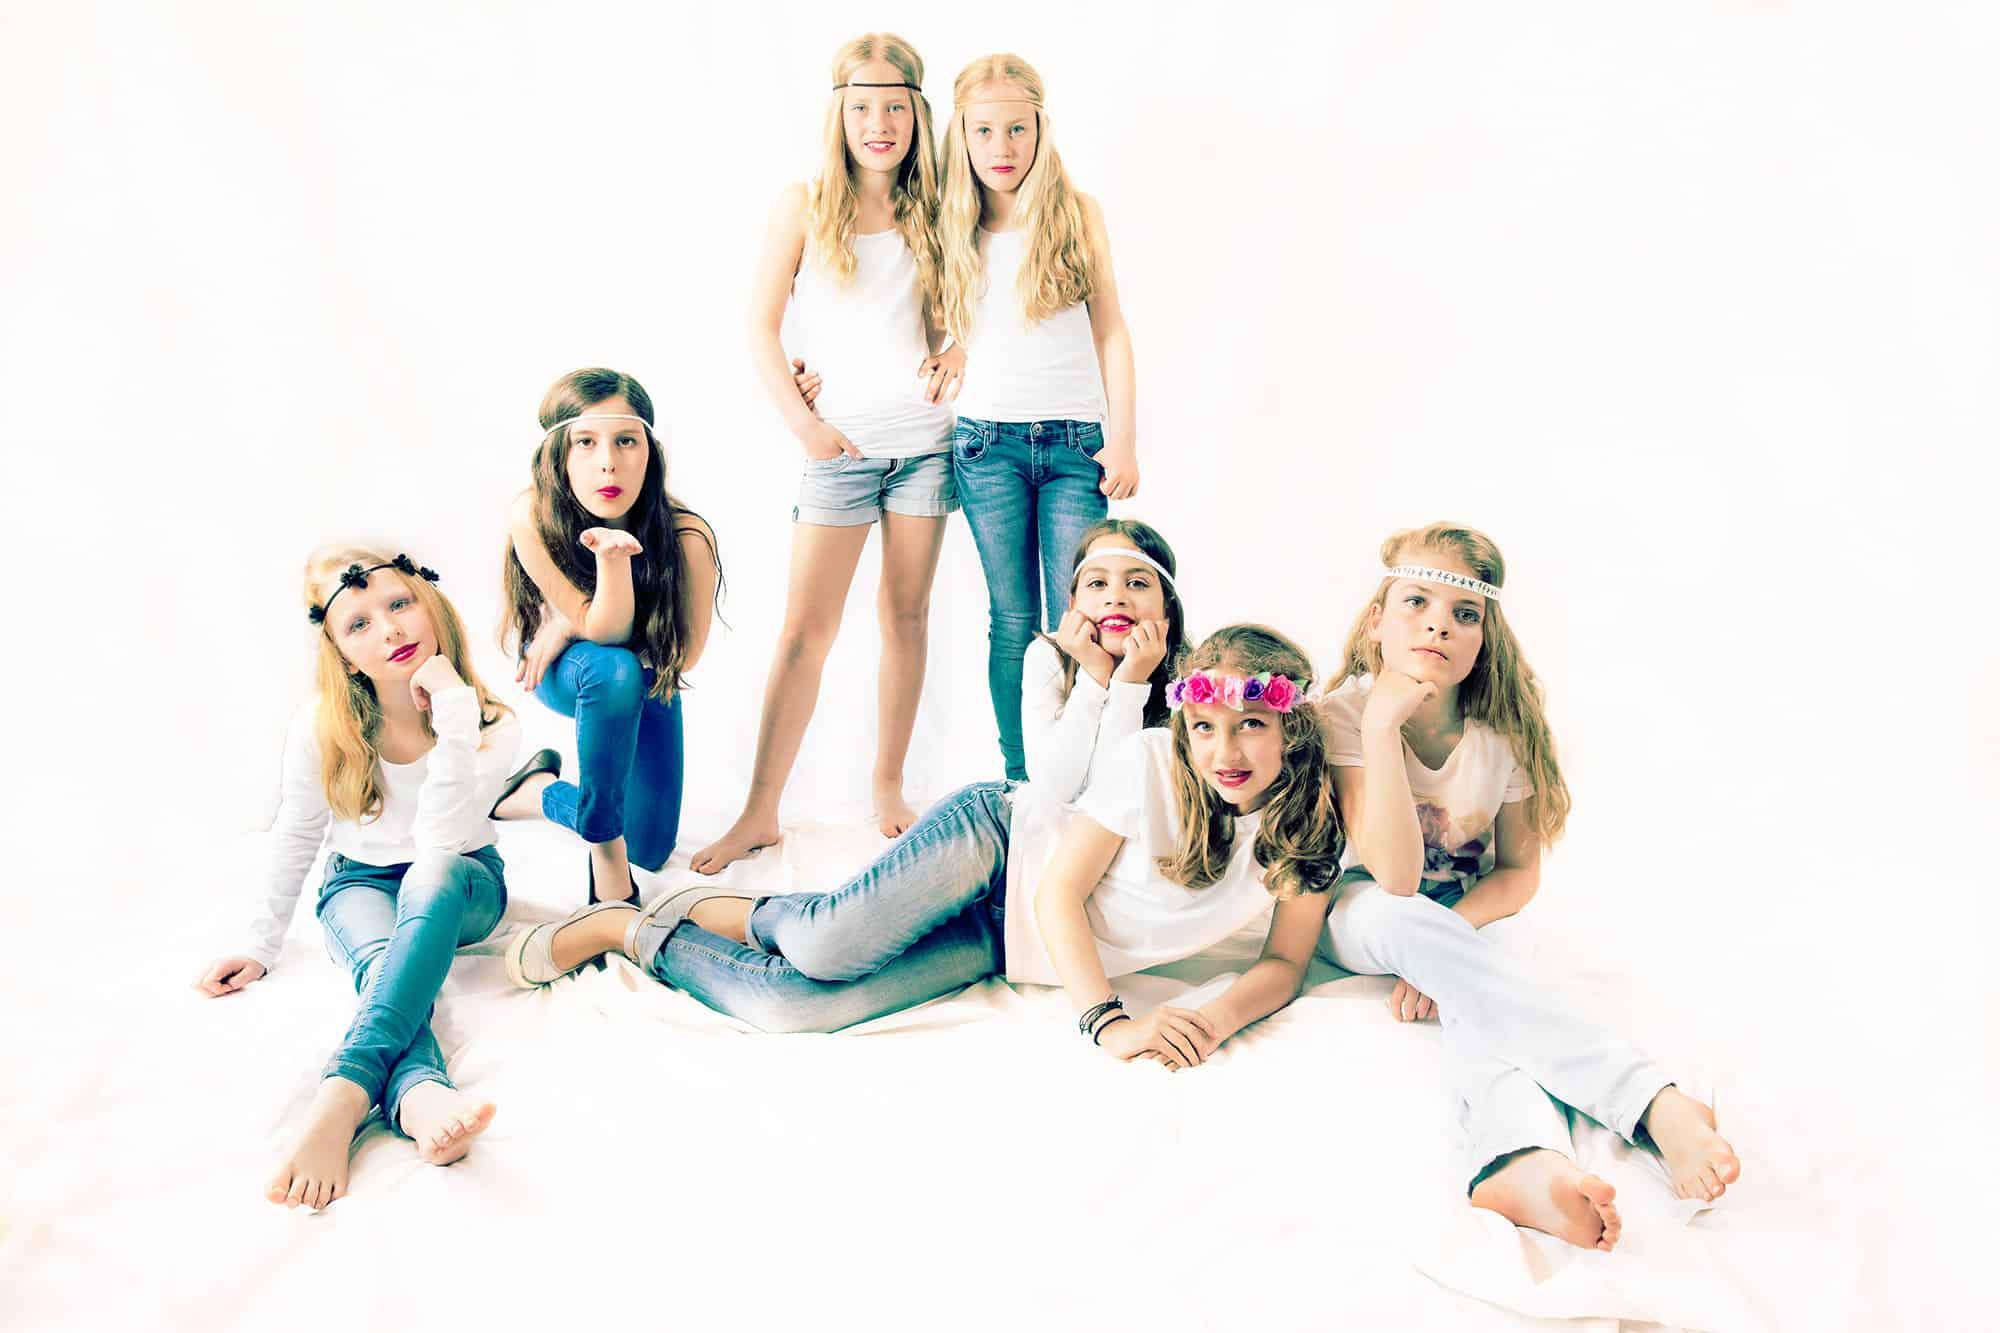 fotostudio Hoofddorp modellenparty kinderfeestje